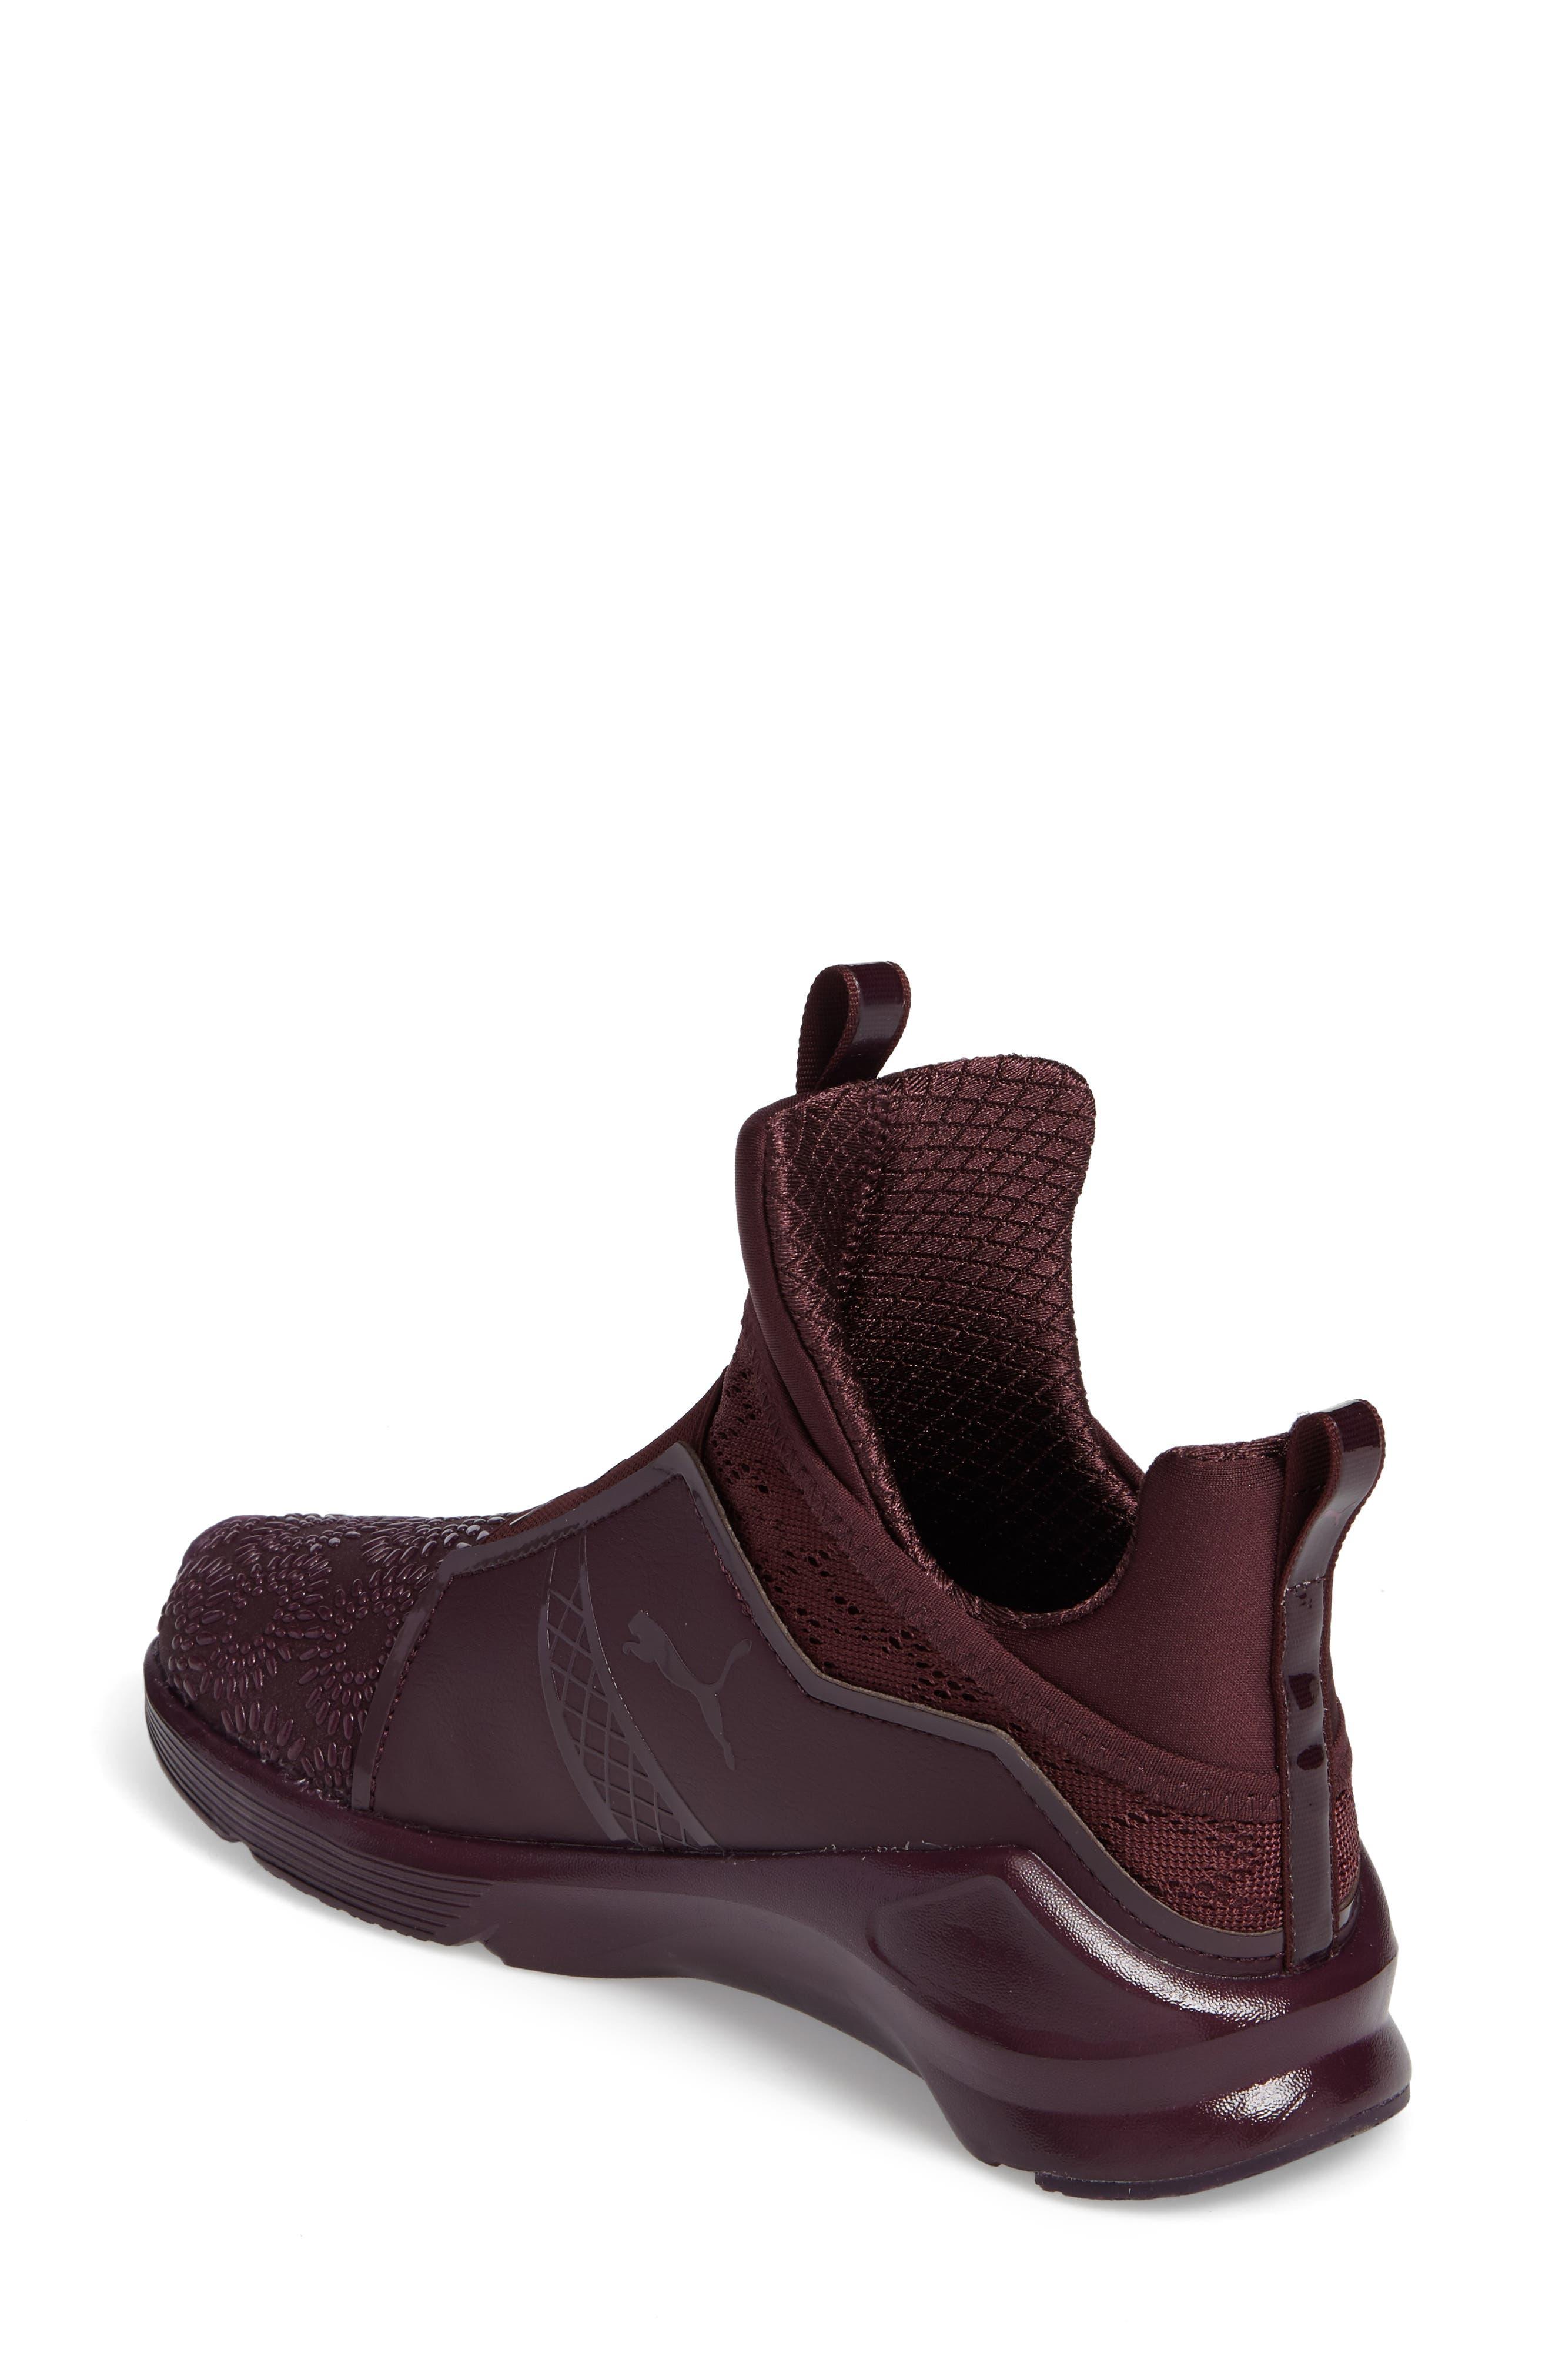 Fierce KRM High Top Sneaker,                             Alternate thumbnail 2, color,                             Red Plum